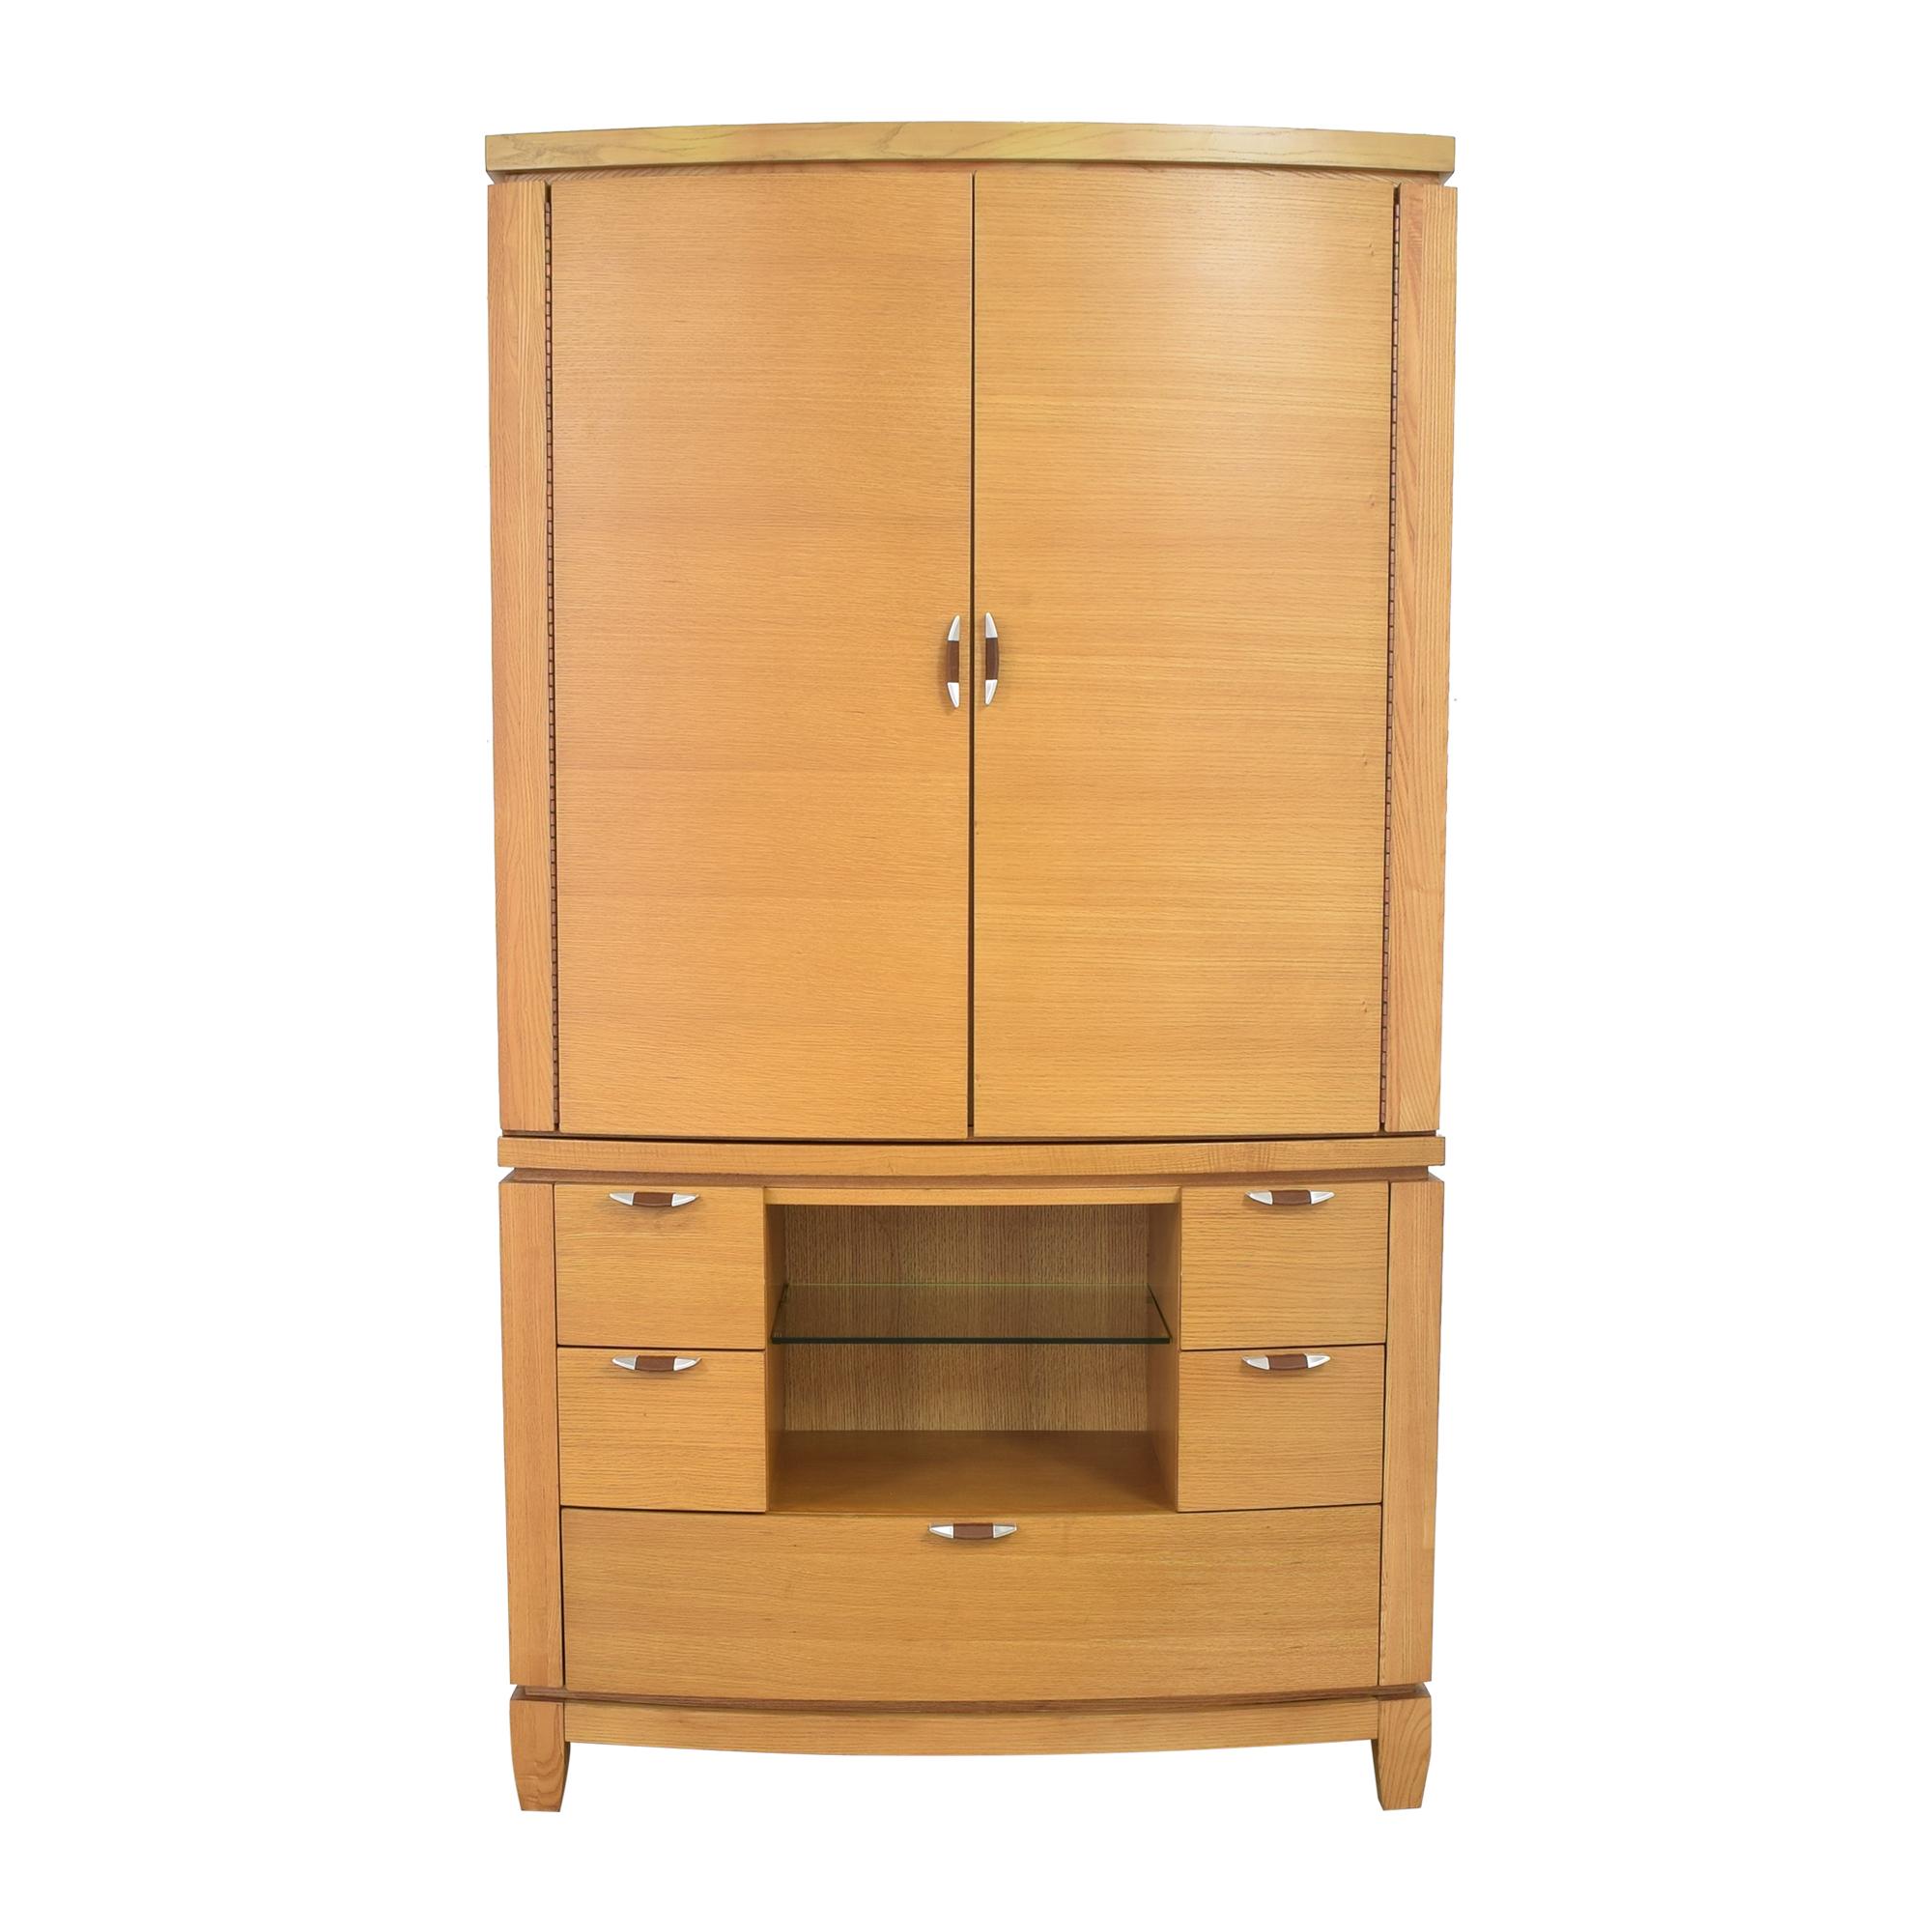 Fairmont Designs Media Armoire  / Storage